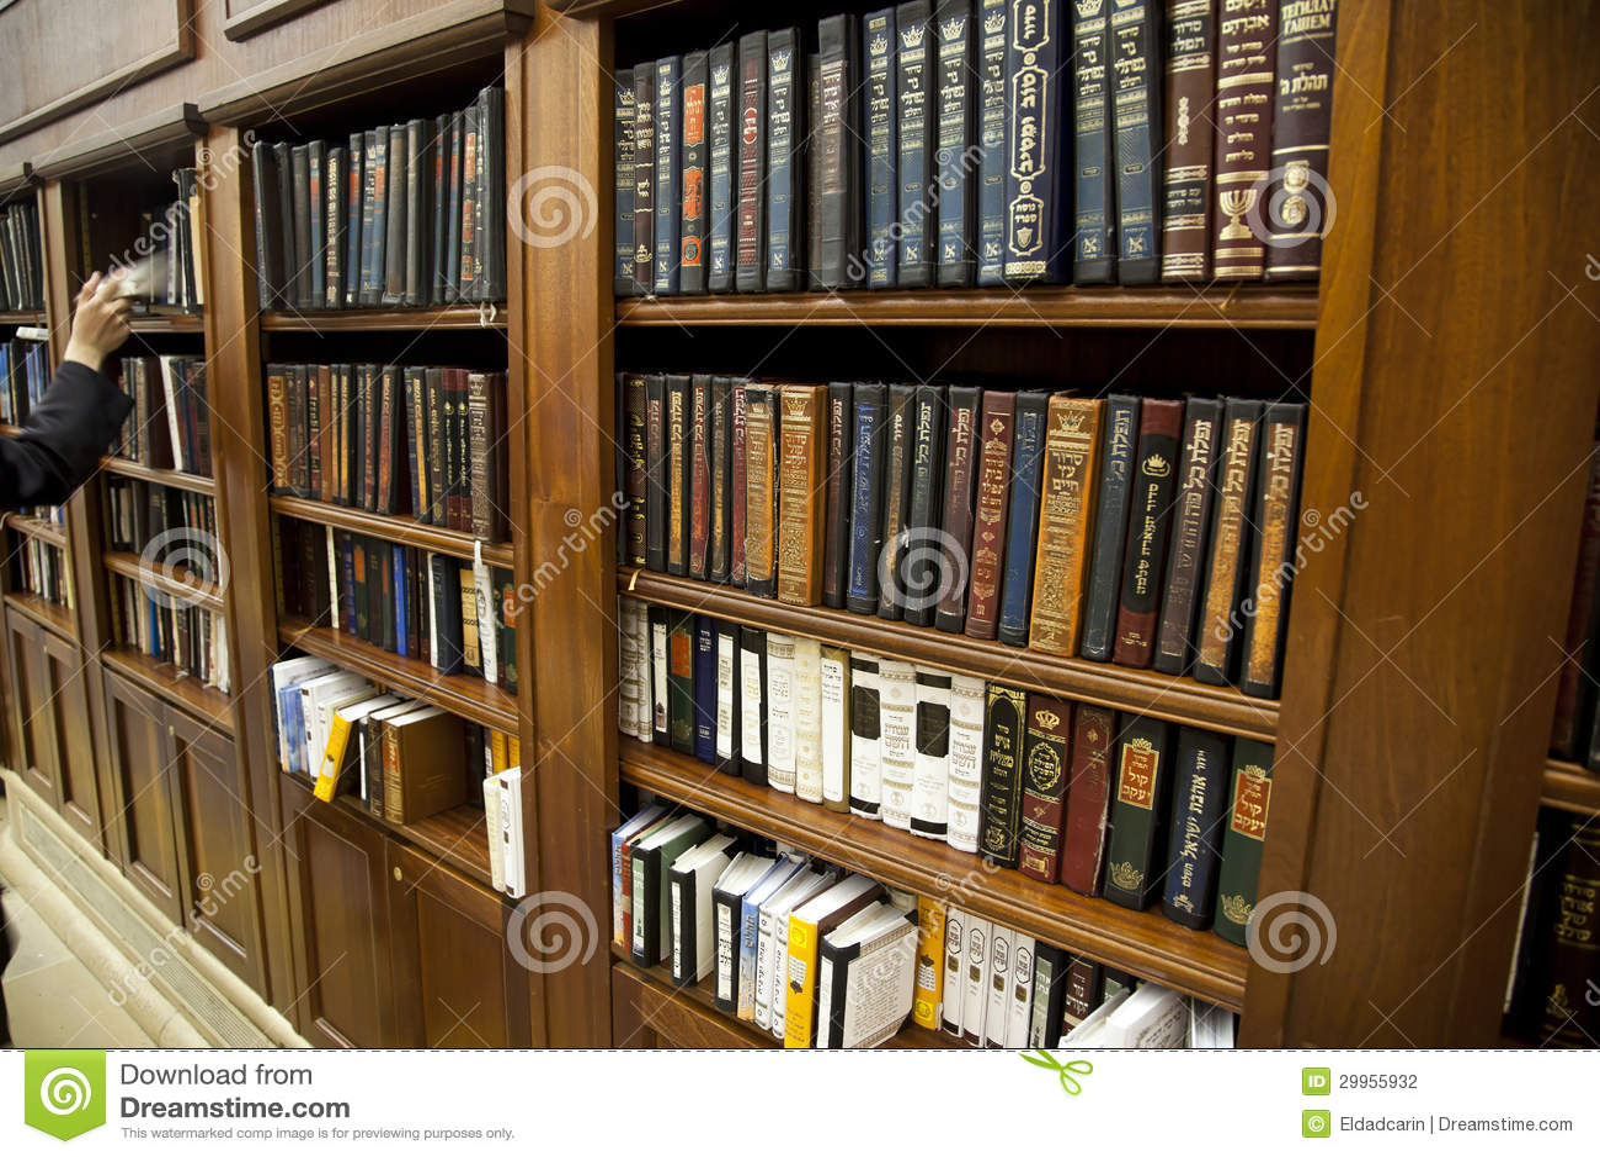 jewish library stock photos - photo #4